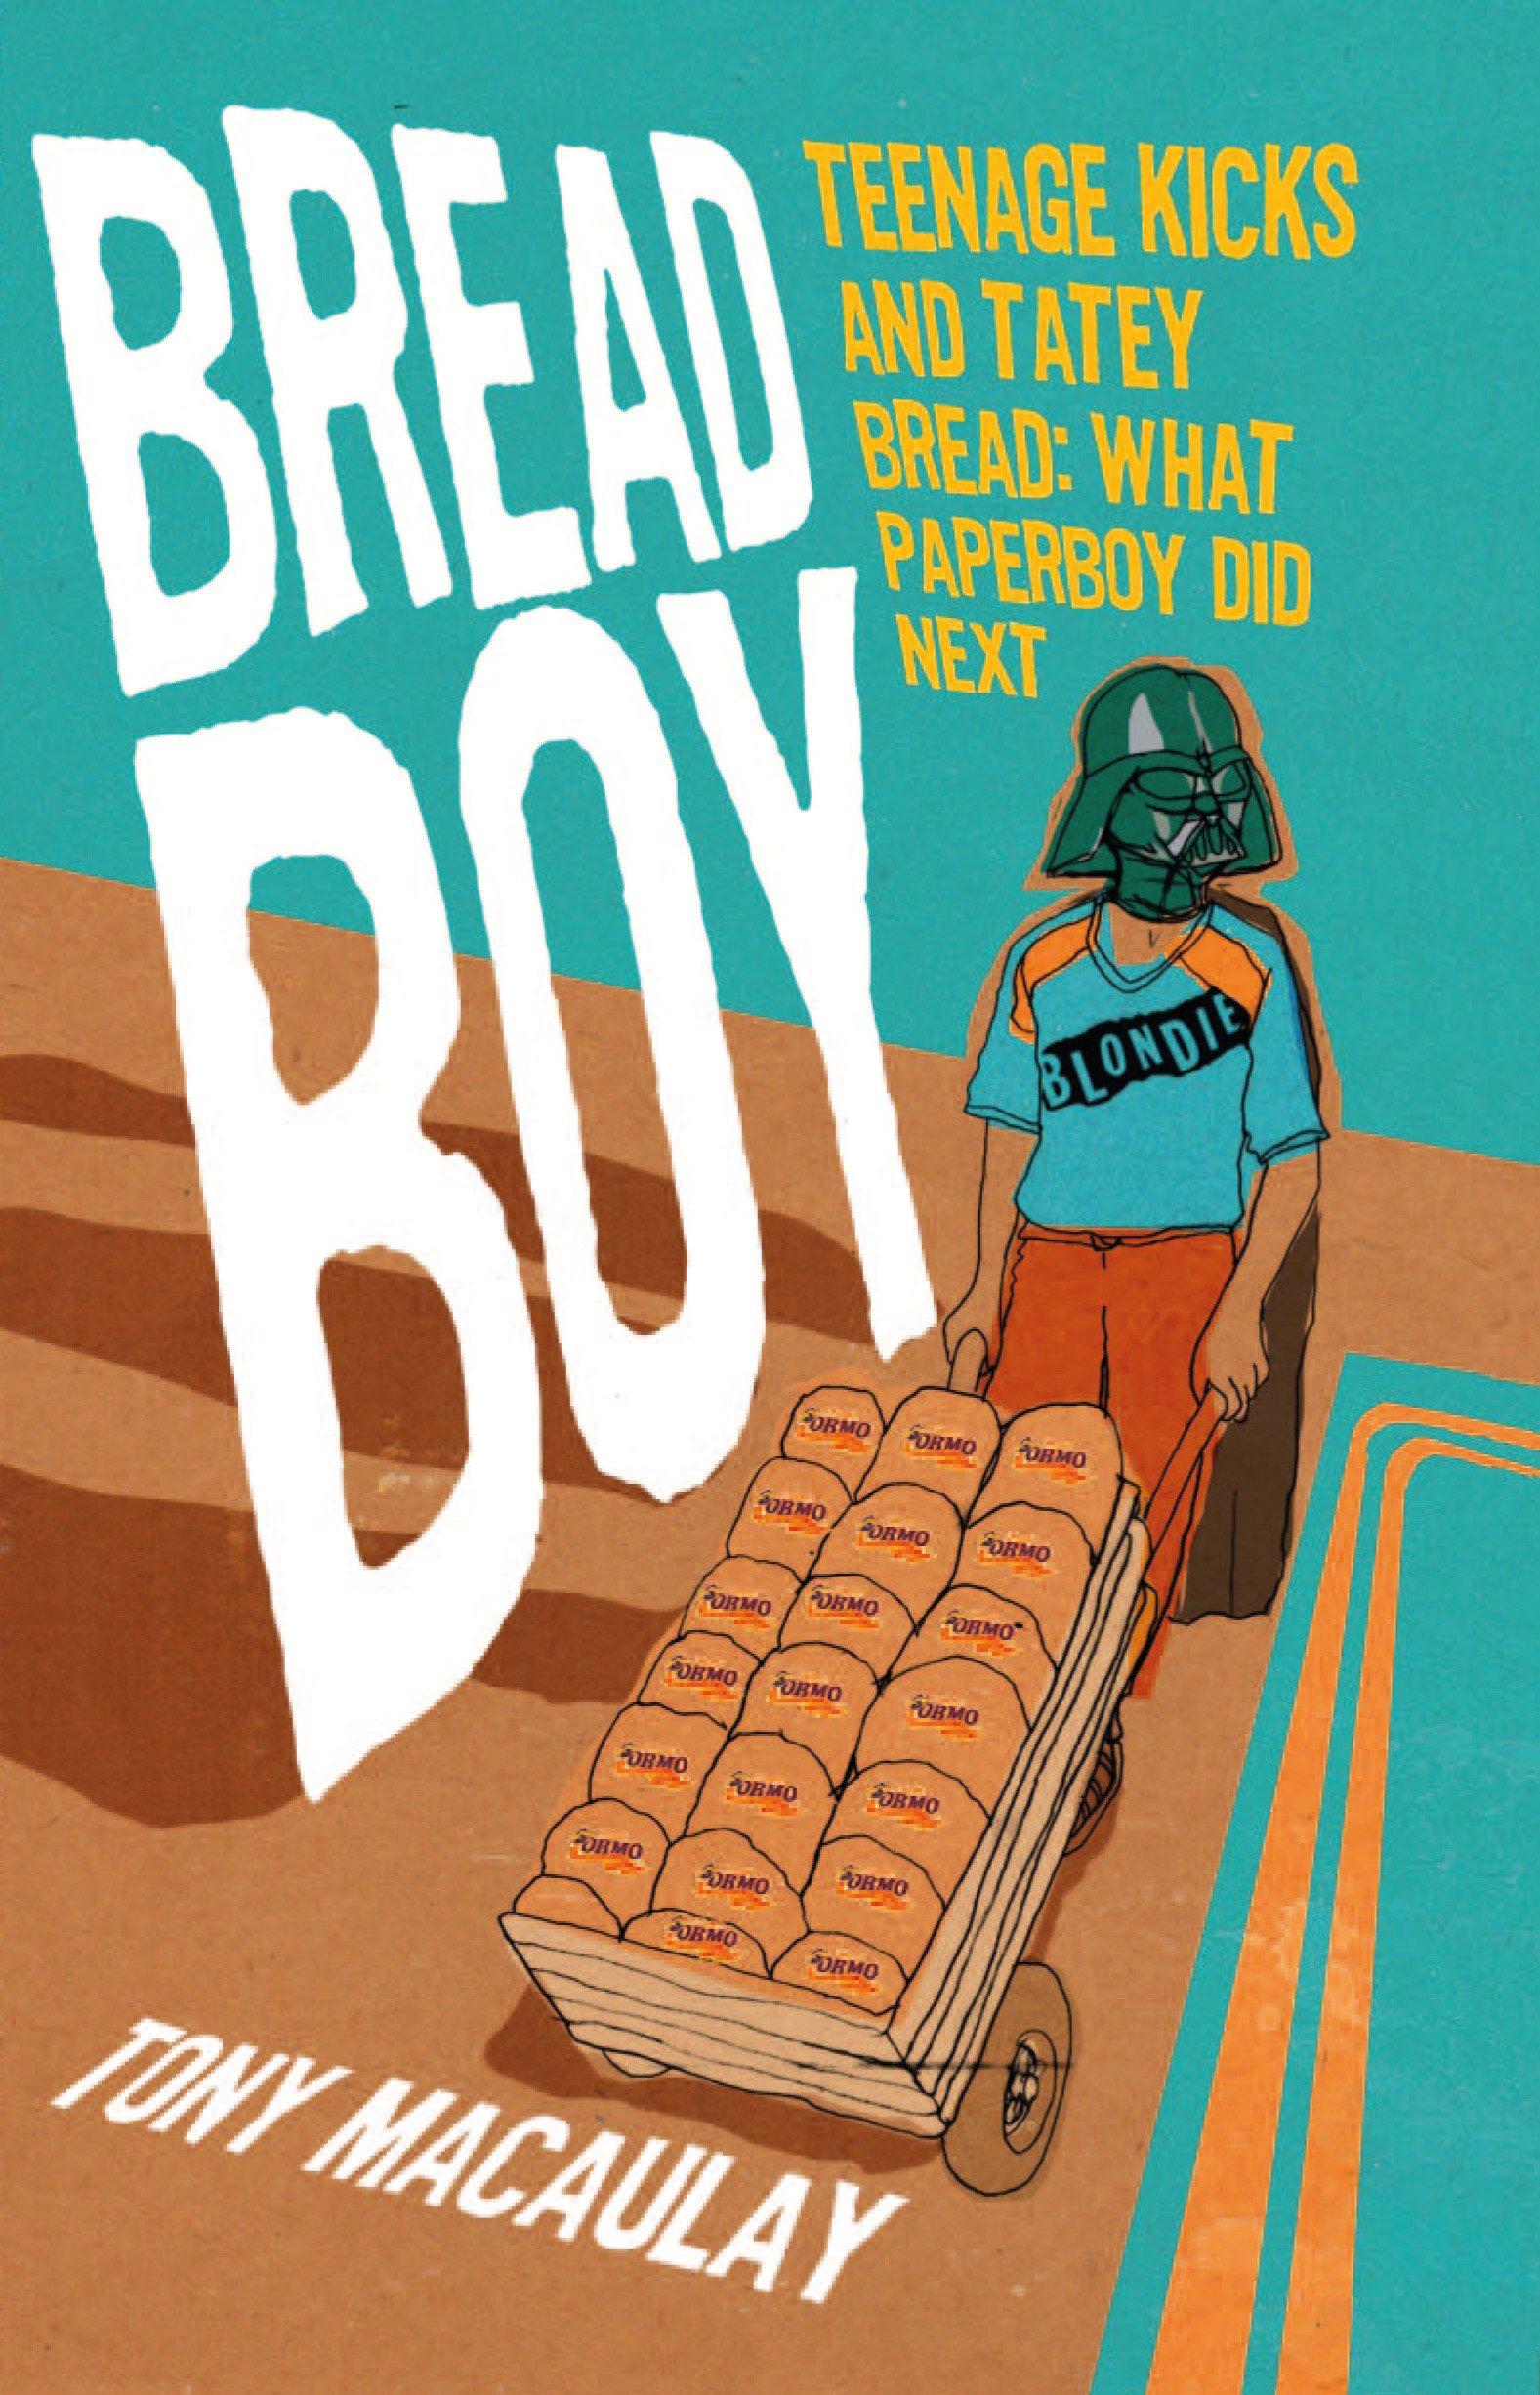 Breadboy: Teenage Kicks and Tatey Bread: What Paperboy Did Next